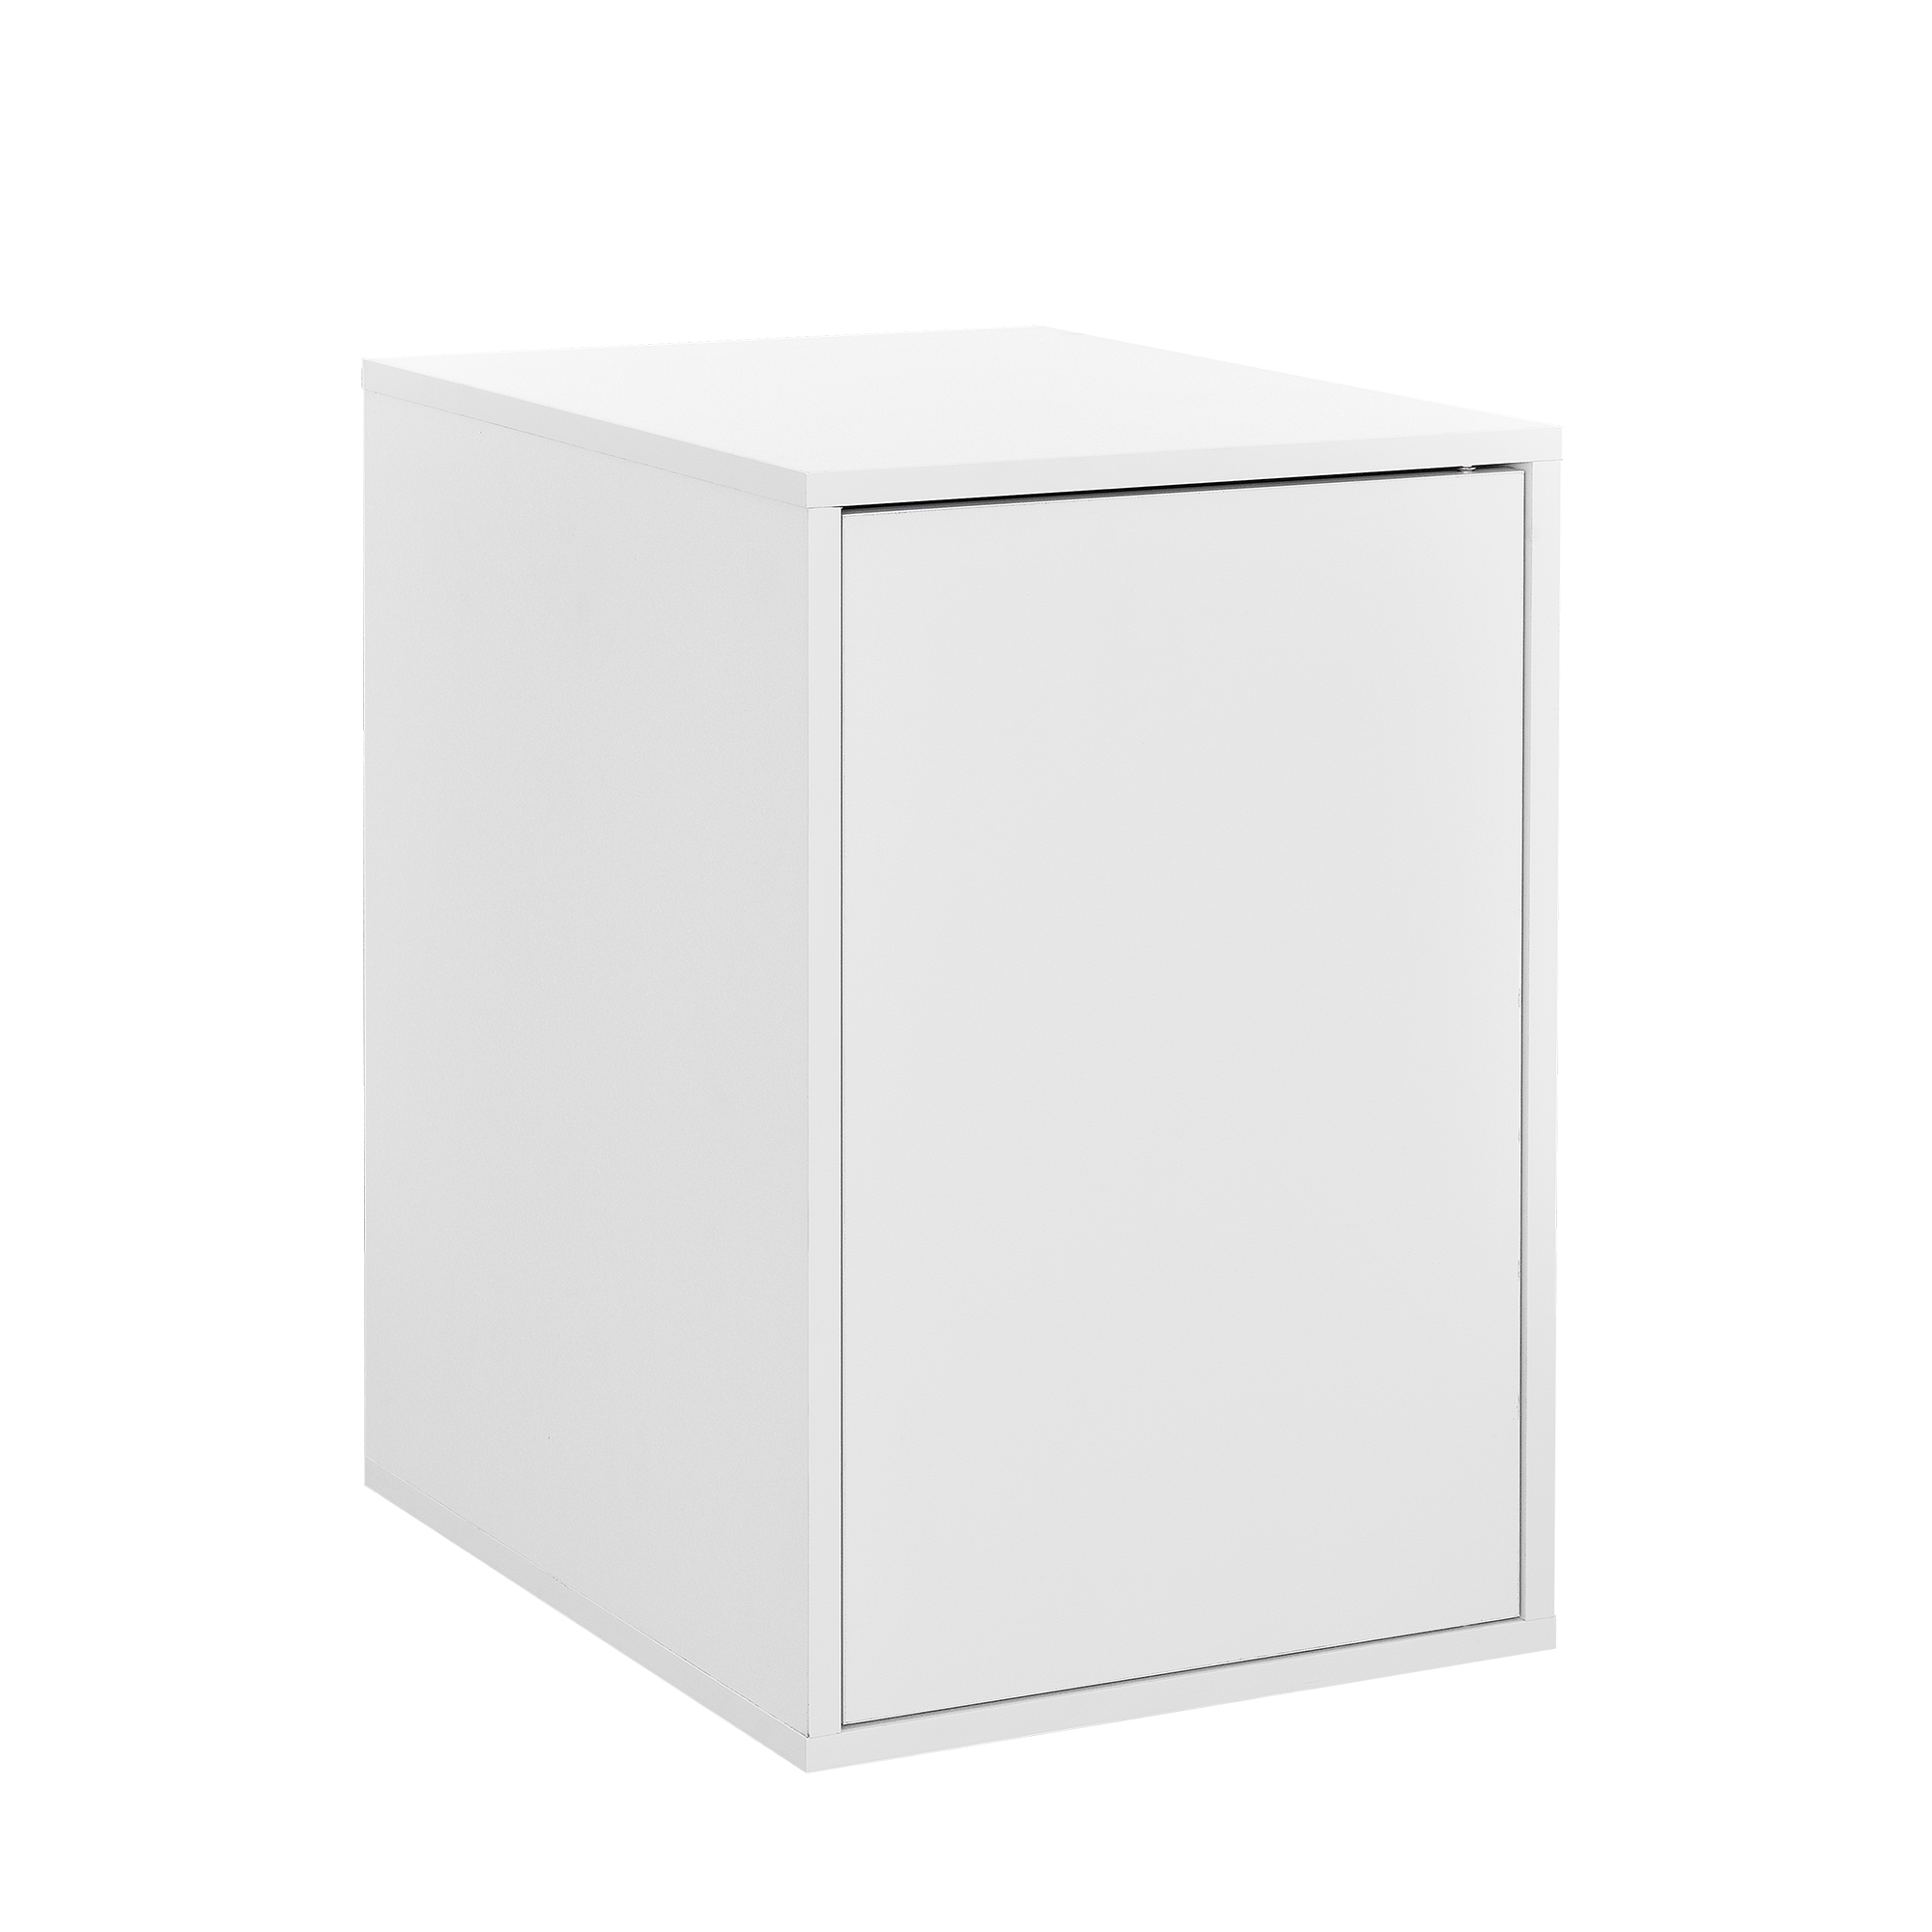 h ngeschrank 30x45x40cm wei wandschrank schrank wandregal regal ebay. Black Bedroom Furniture Sets. Home Design Ideas